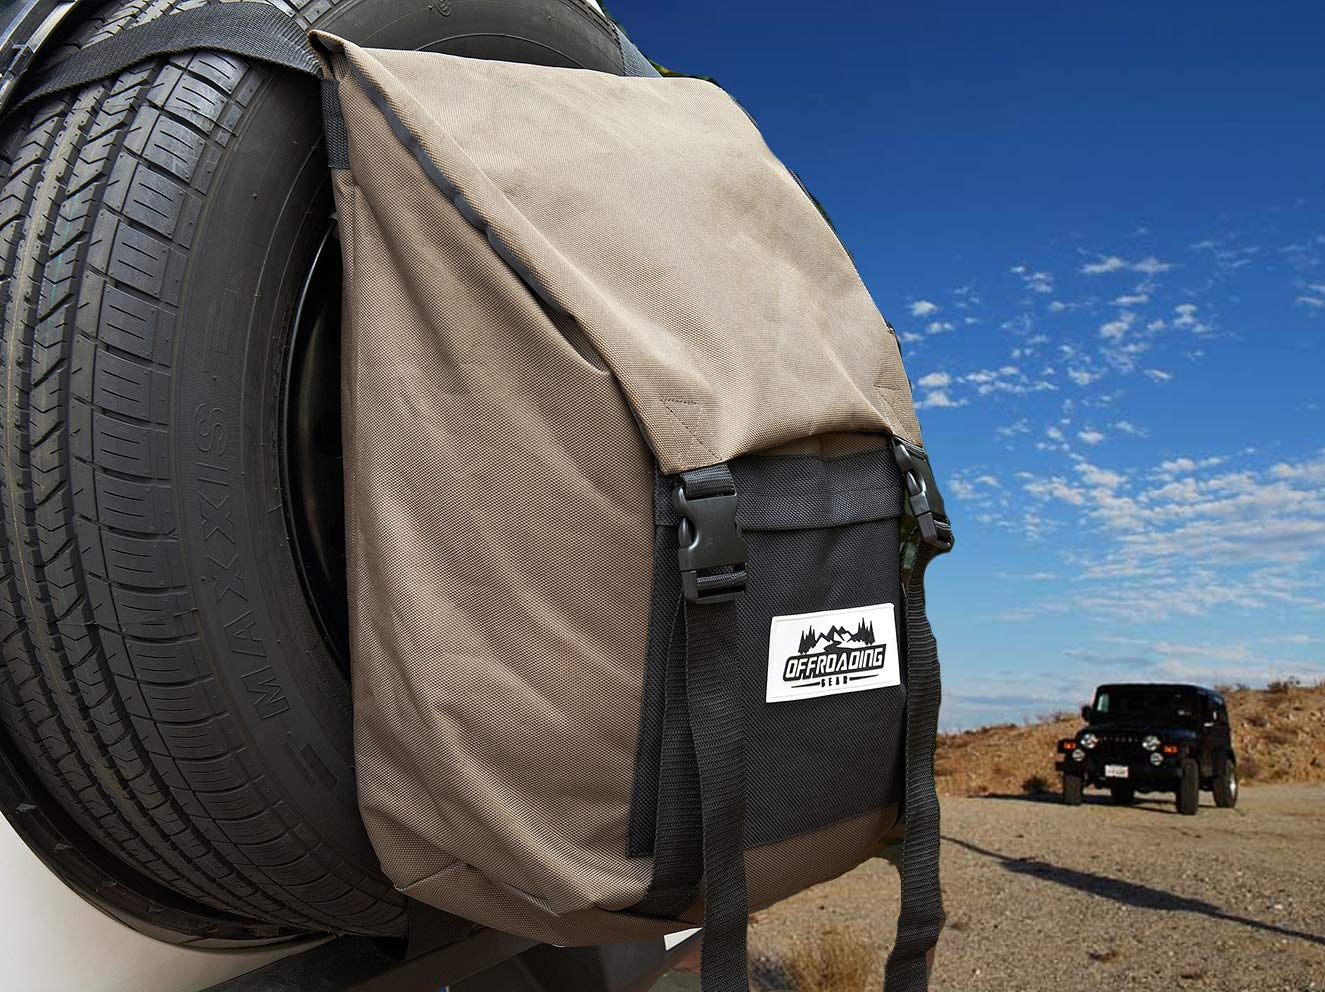 Spare Tire Trash and Gear Bag w/Seat Organizer - for Jeep/SUV/RV